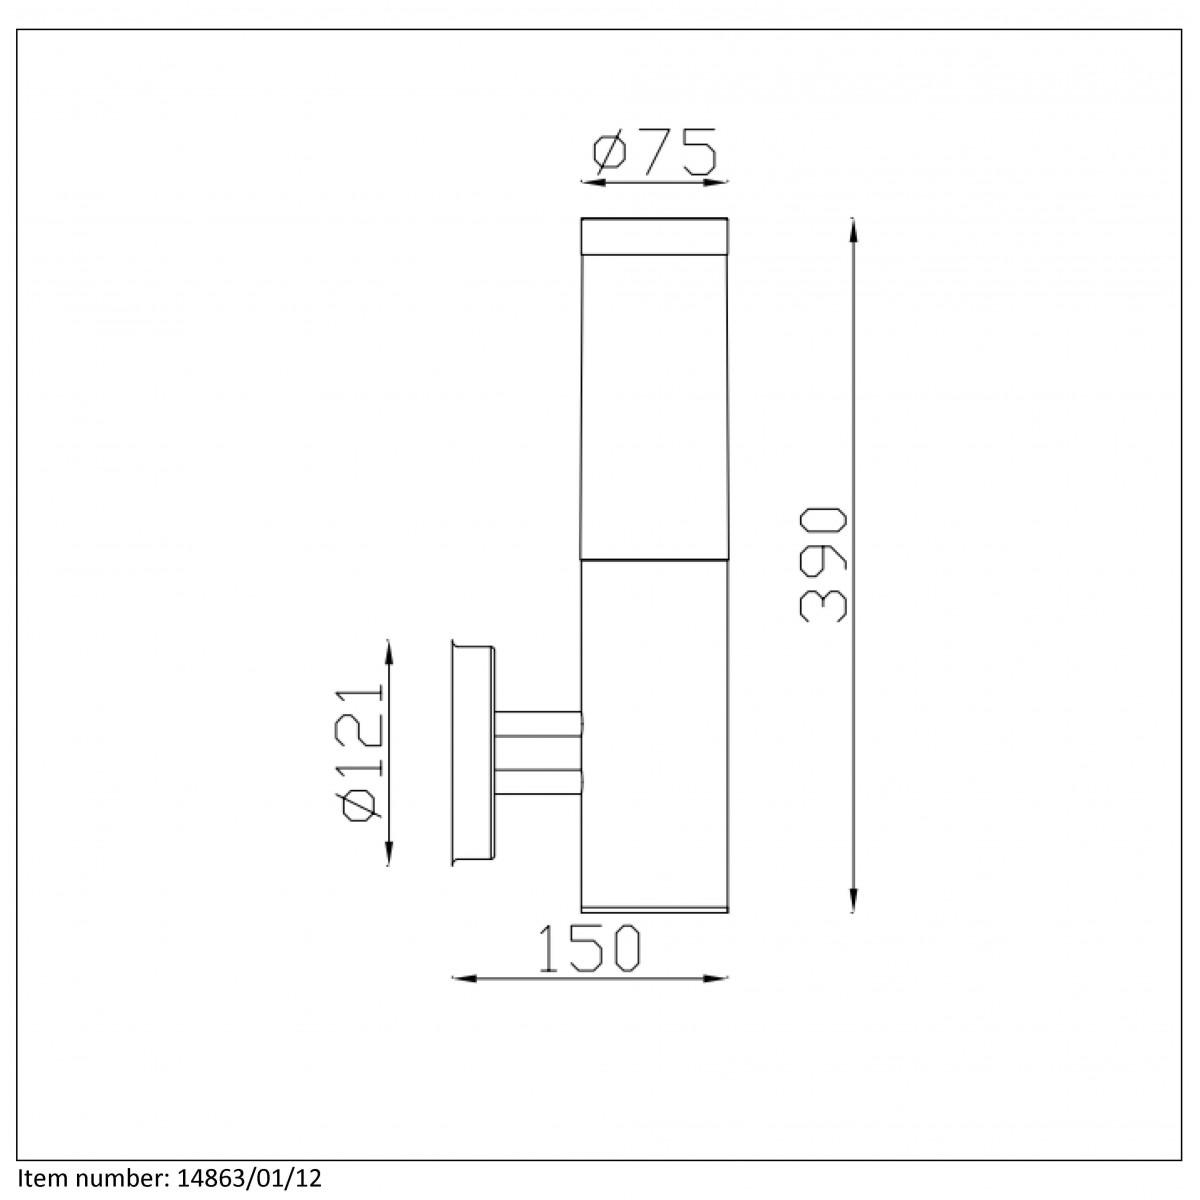 Lucide KIBO Kinkiet IP44 H39cm E27 Satin Chrome 14863/01/12